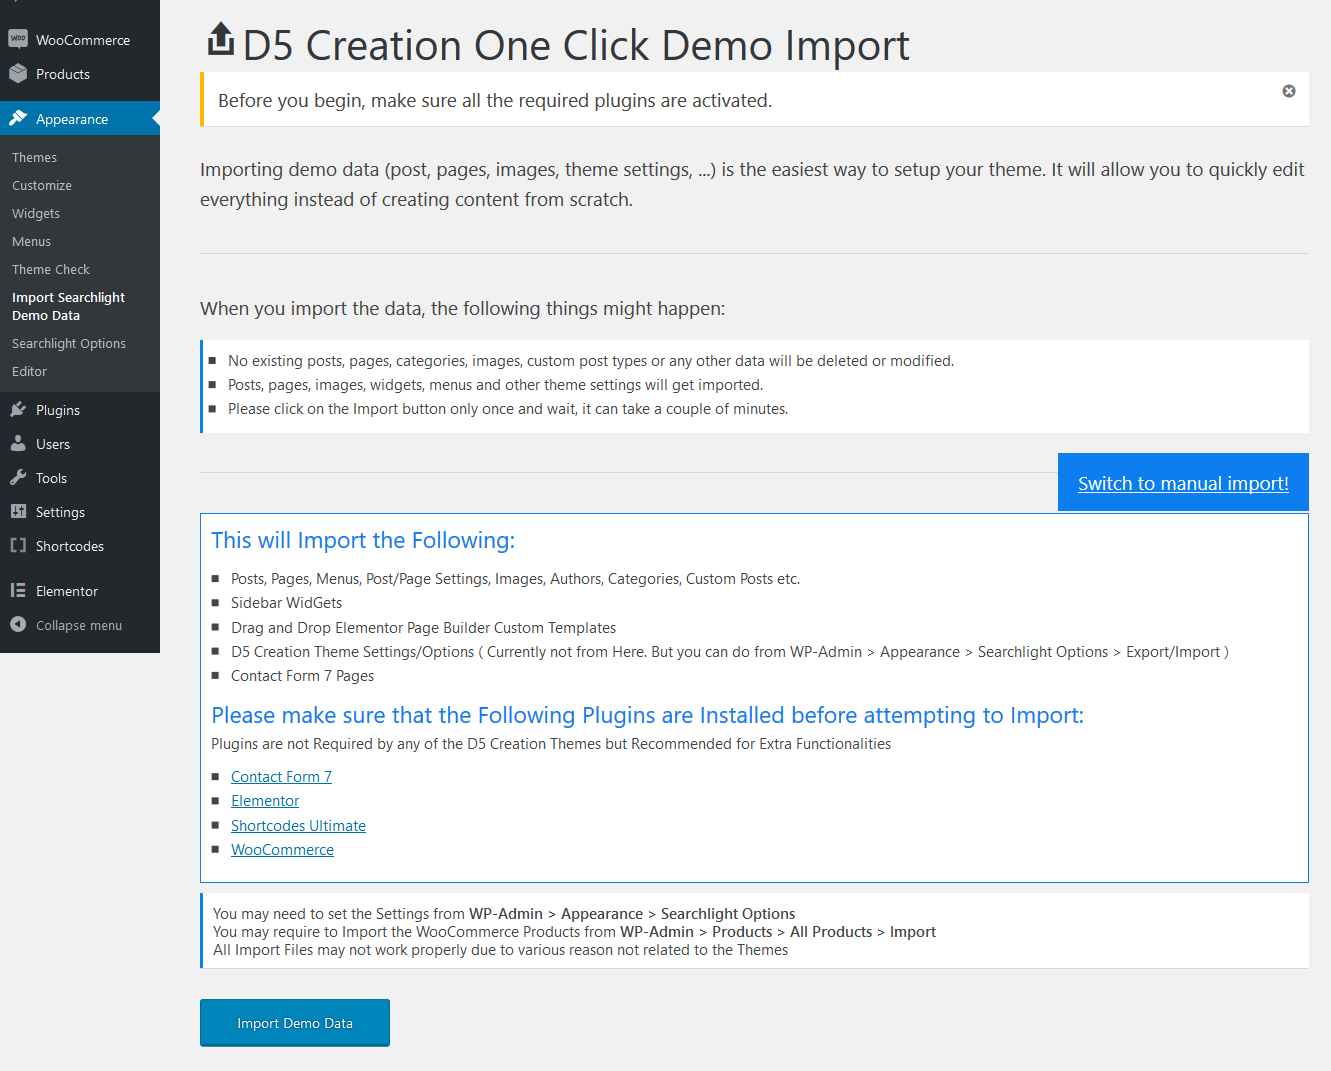 Click Demo Import